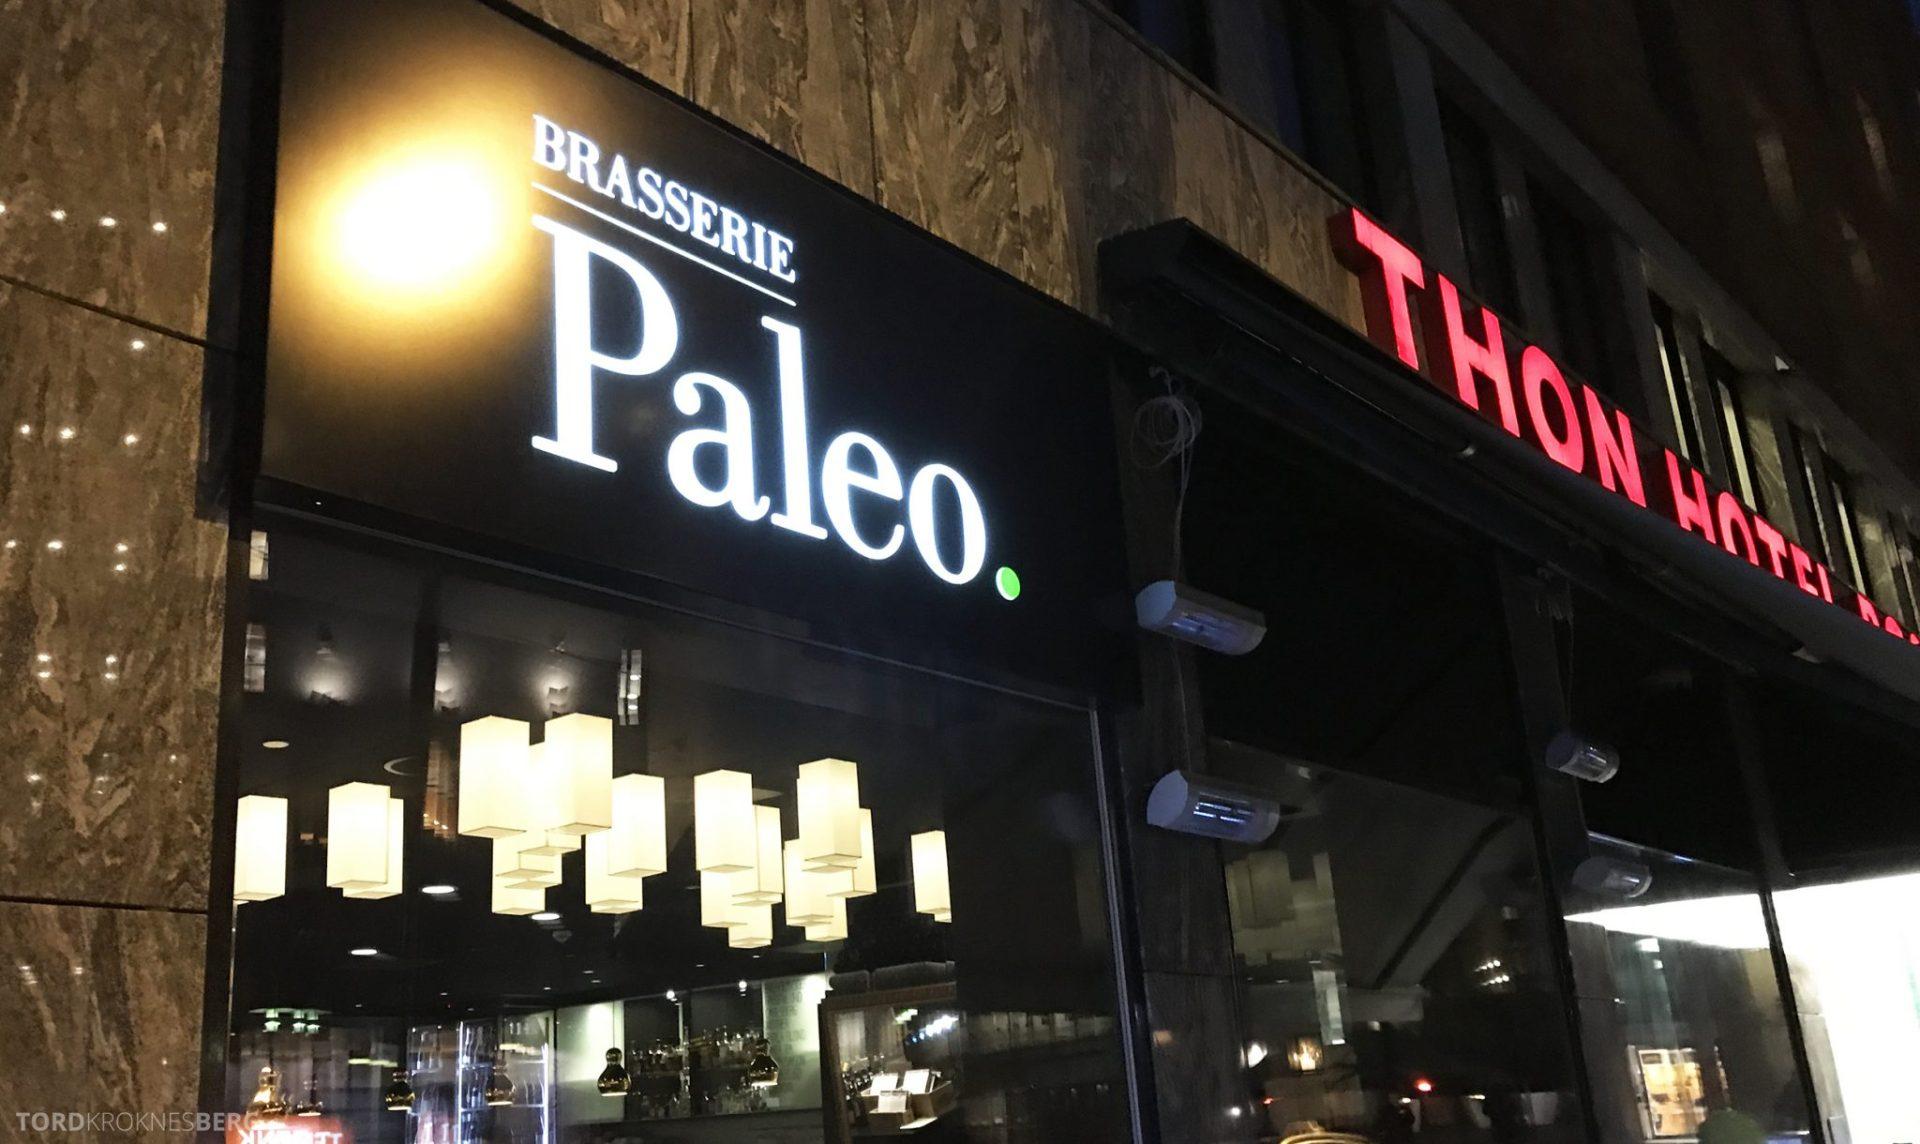 Brasserie Paleo Oslo inngang